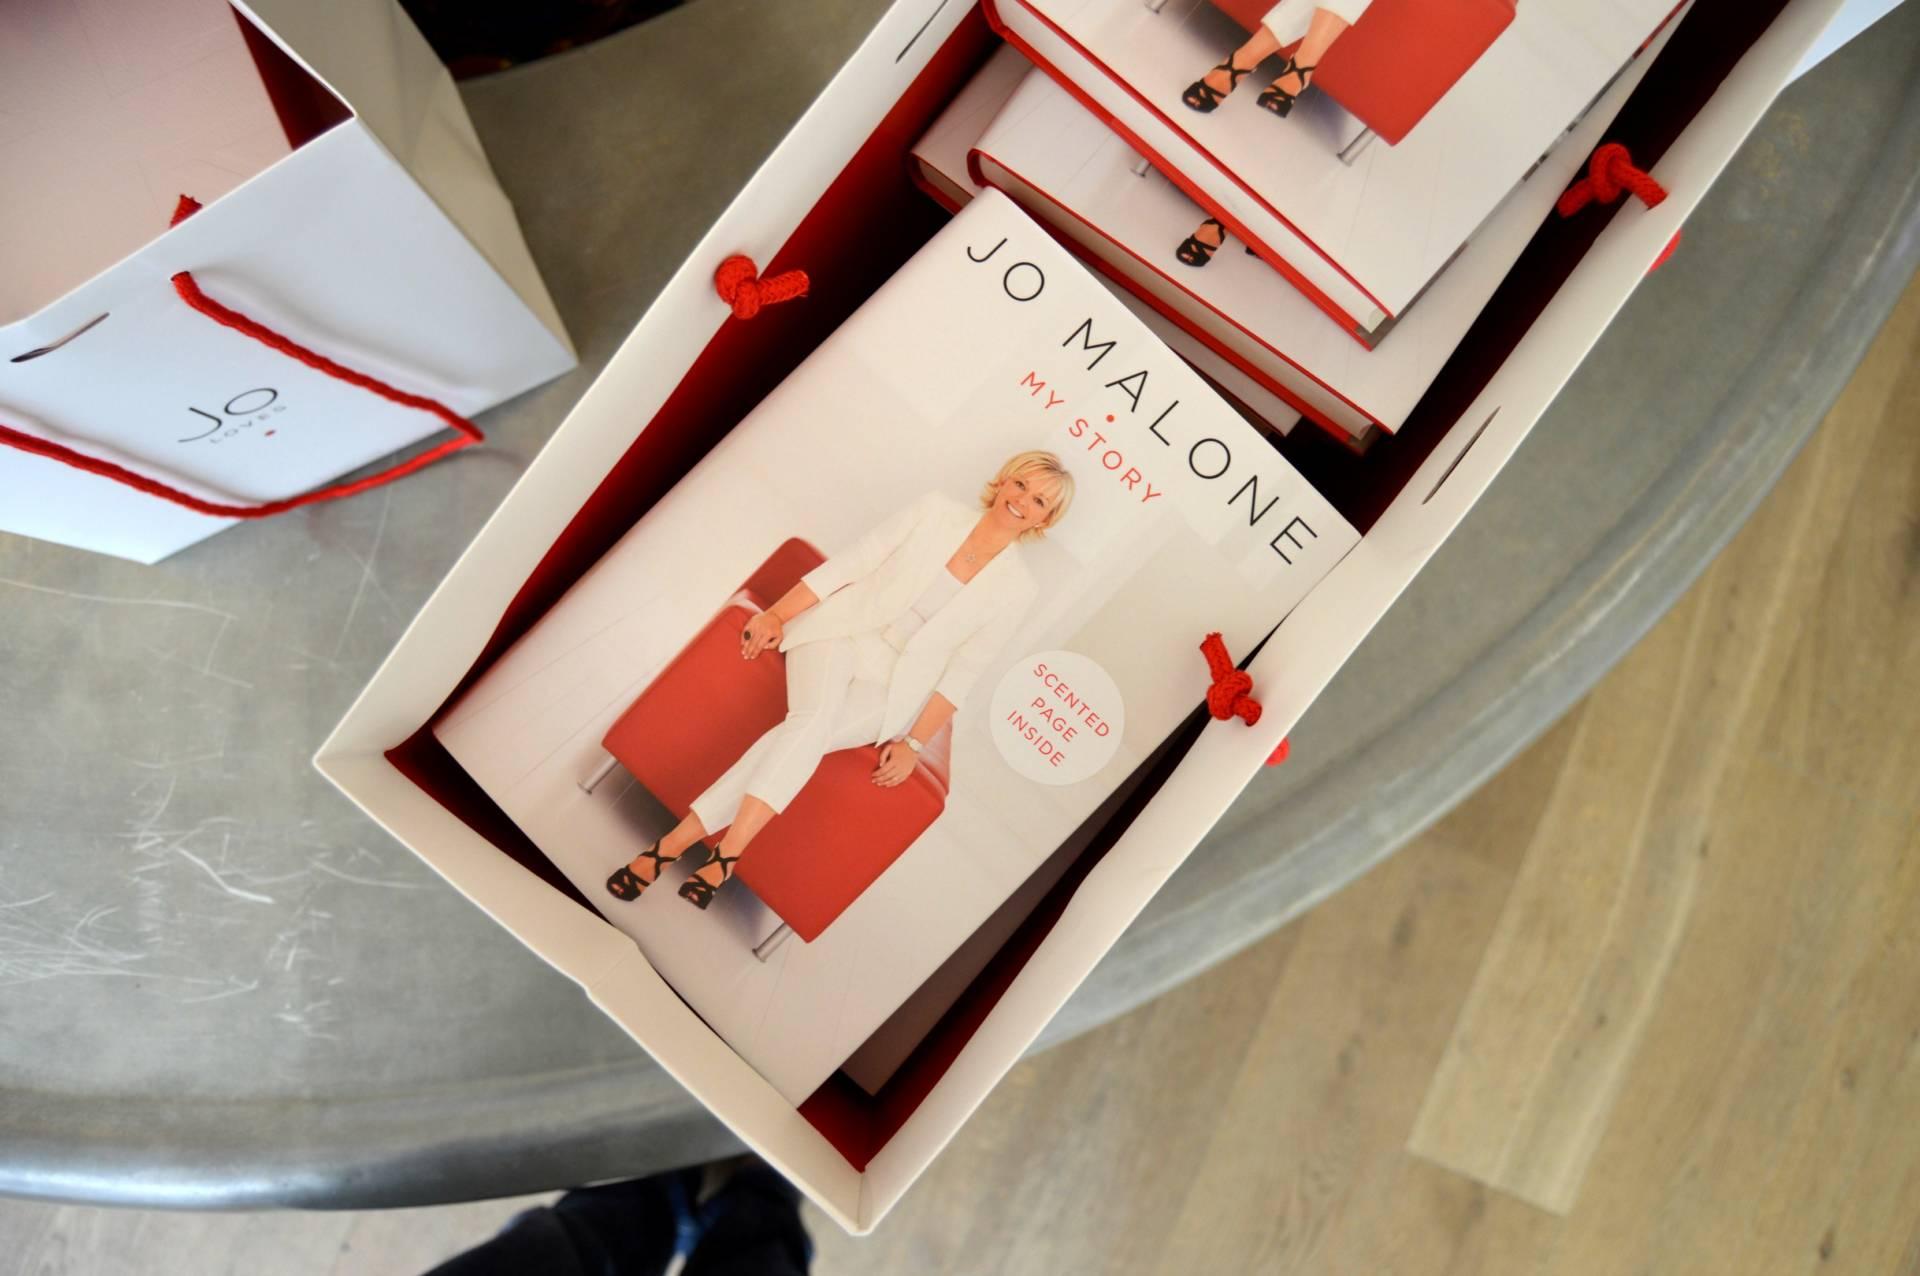 jo-loves-my-story-book-launch-london-shopping-inhautepursuit-travel-review-loves